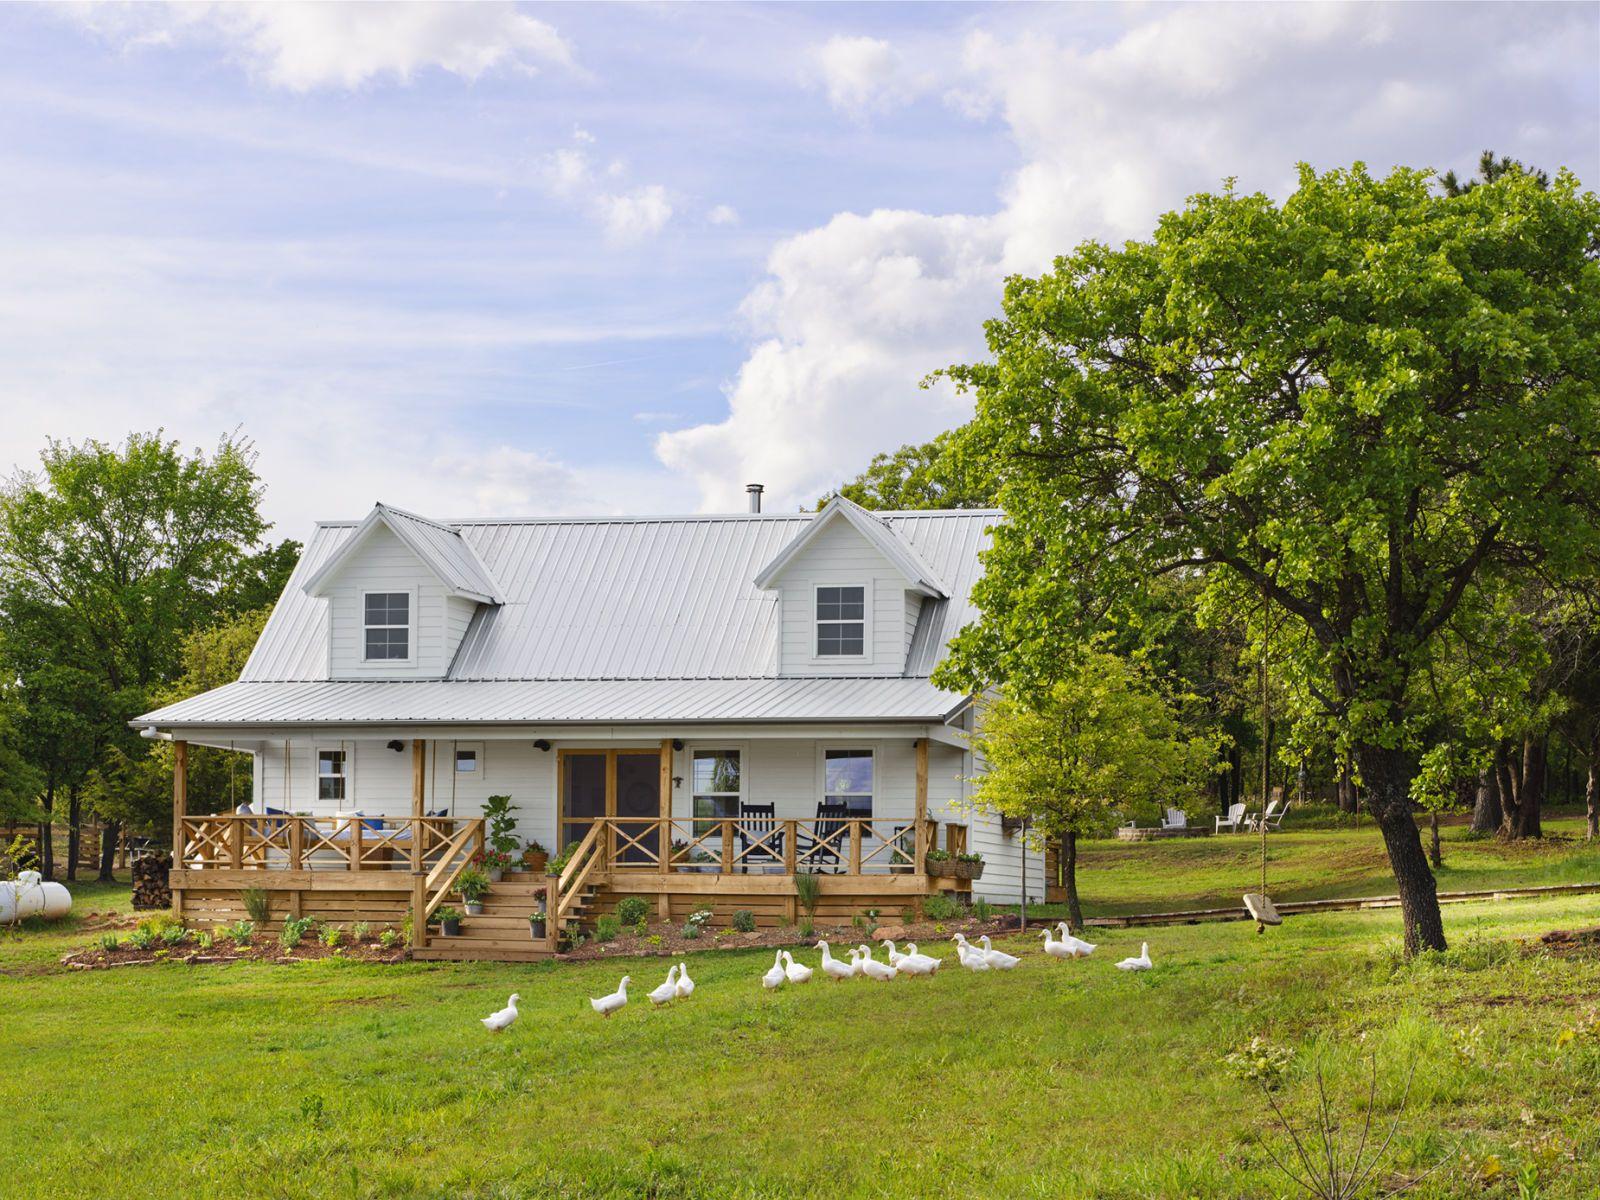 Big nice farm houses of houses are the new old - Farm House